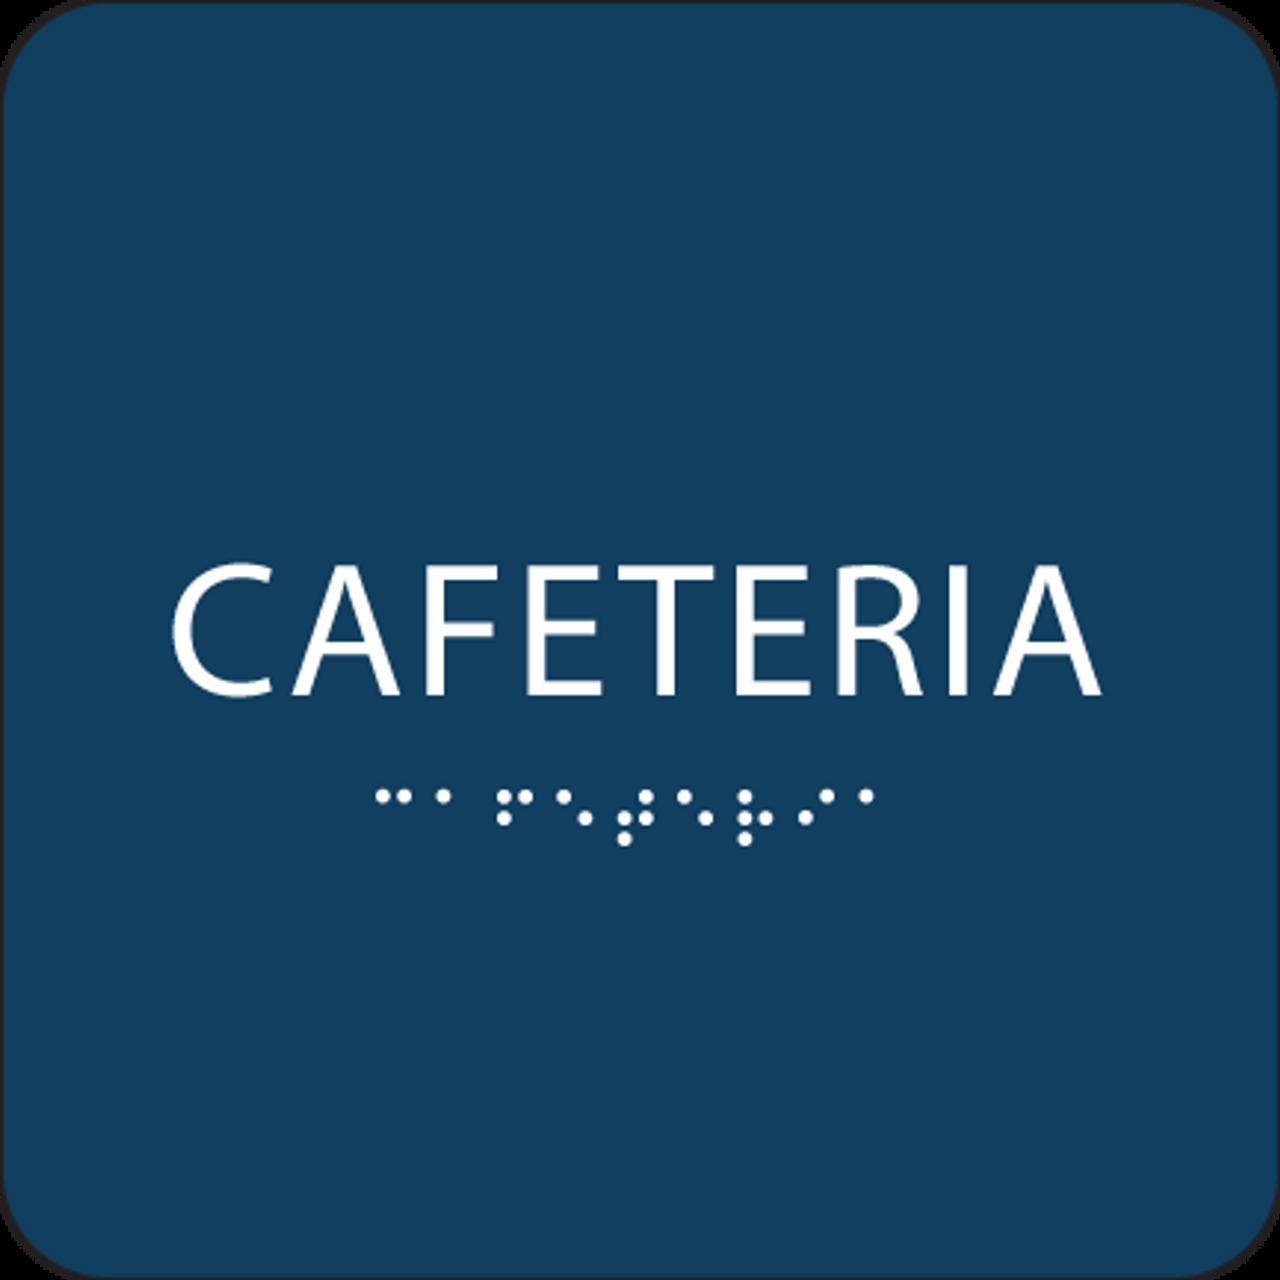 Dark Blue Cafeteria ADA Sign